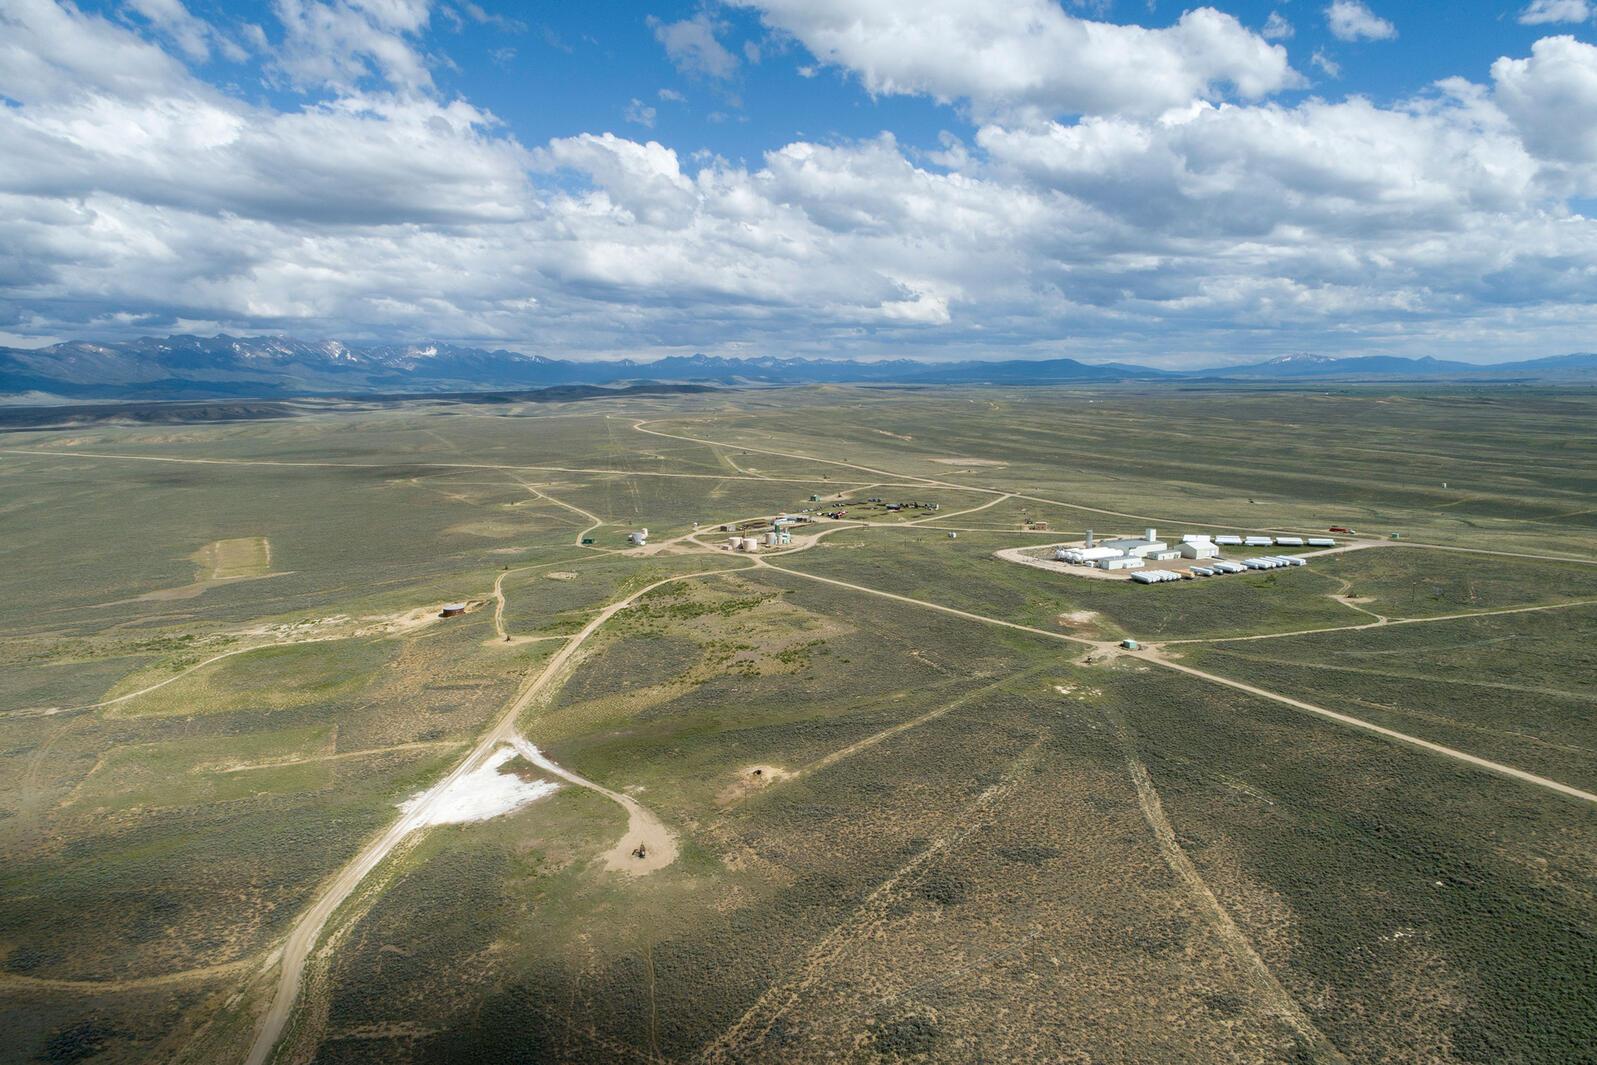 BLM-managed oil field in Jackson County, Colorado. Evan Barrientos/Audubon Rockies